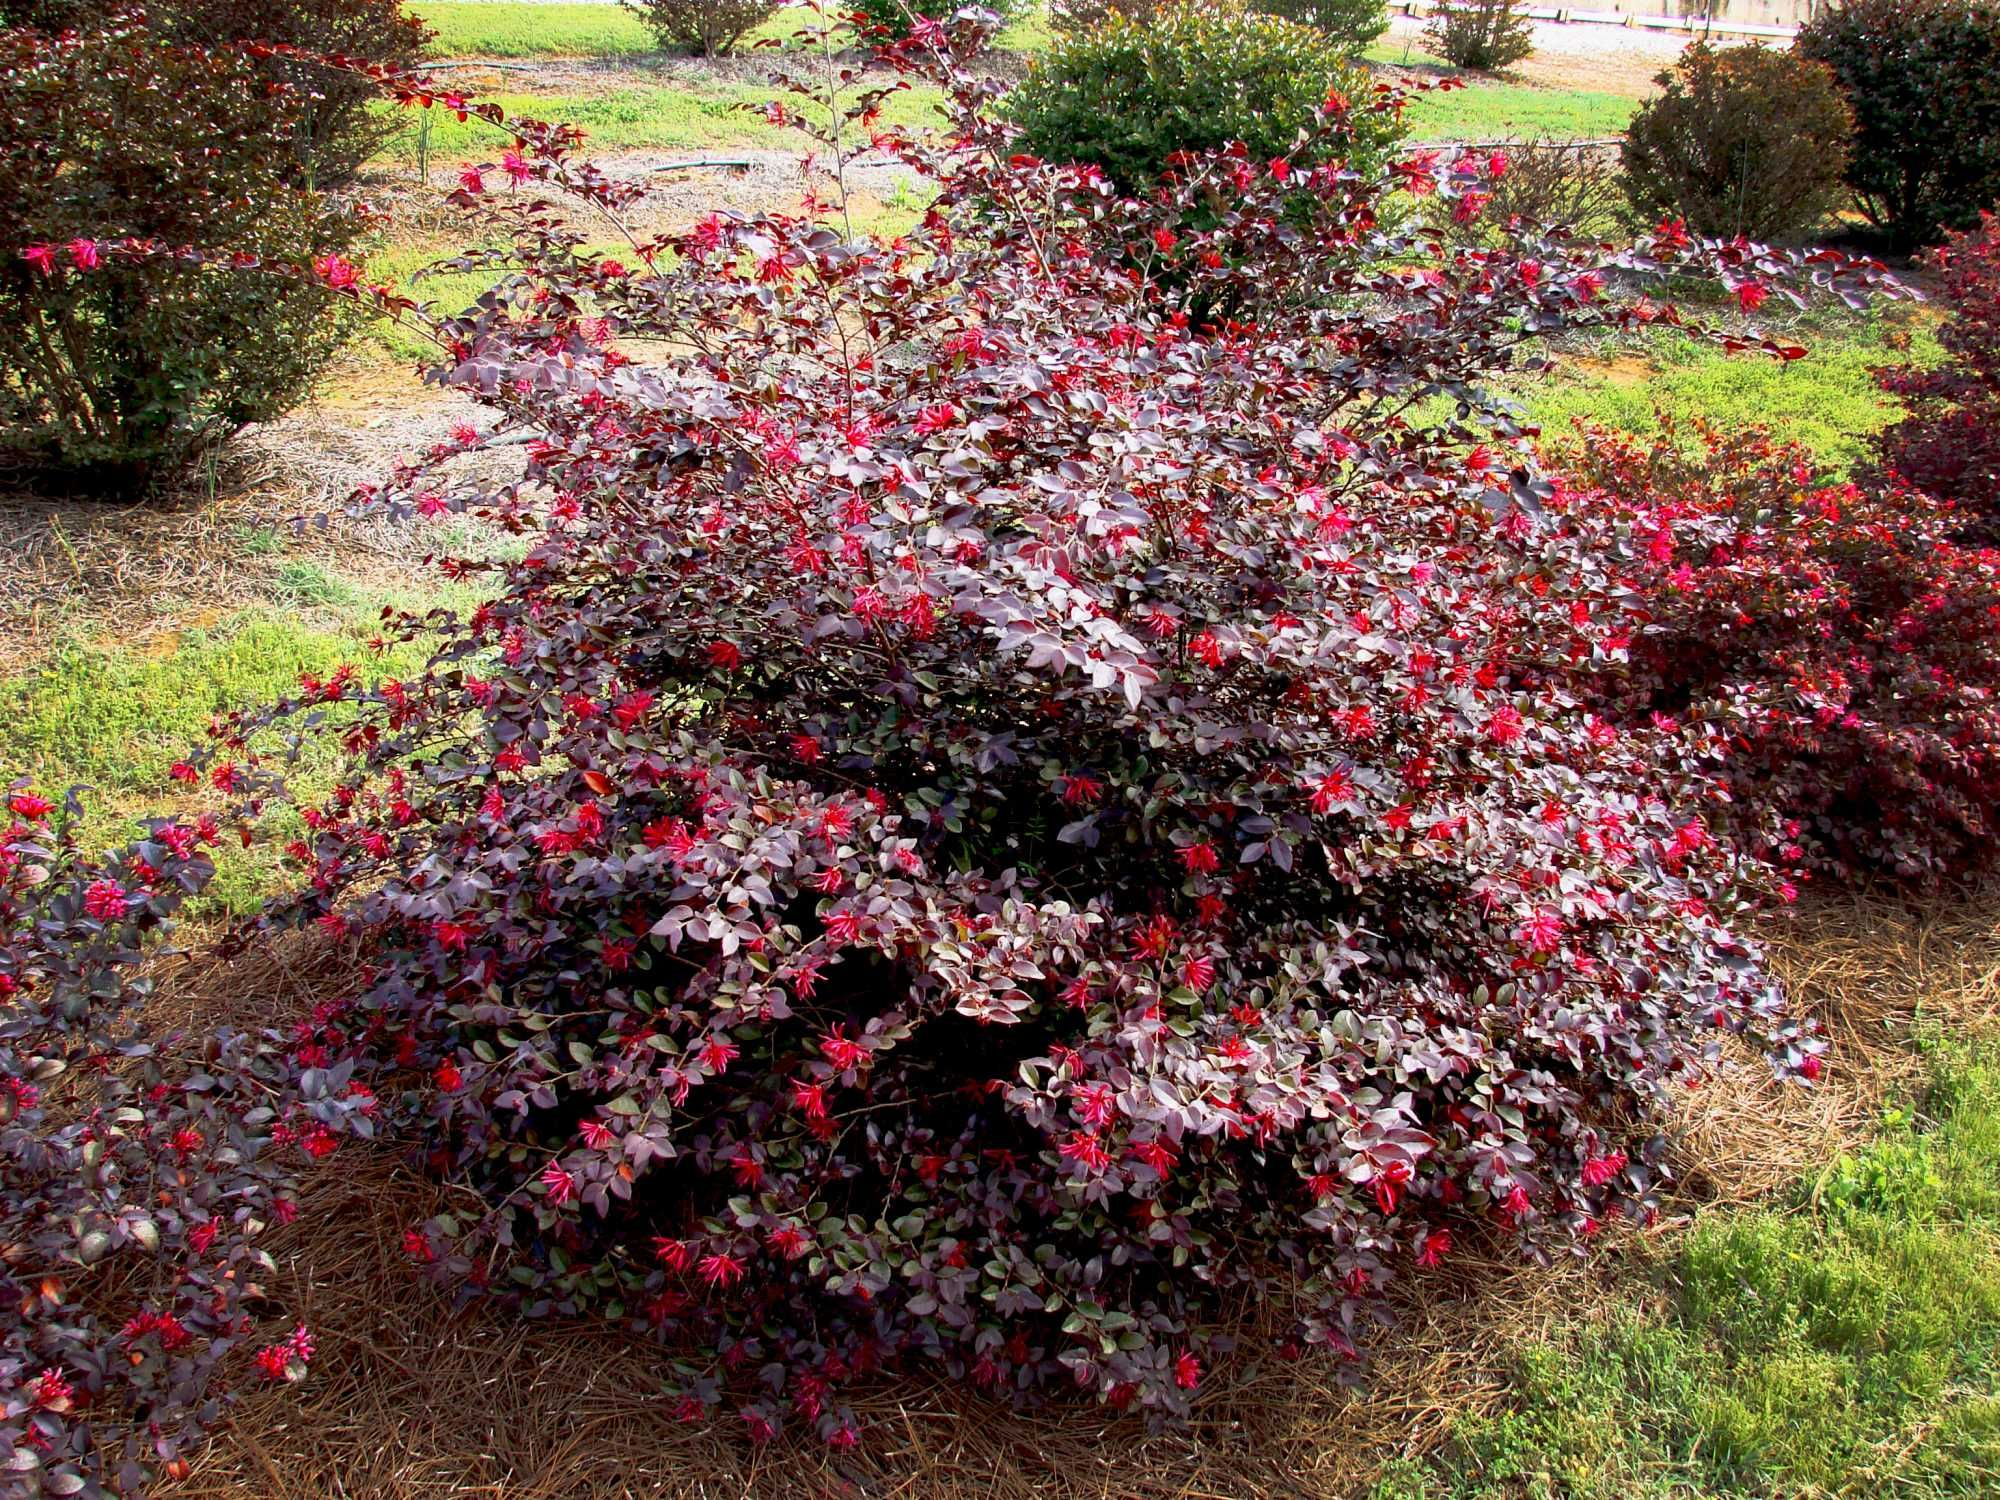 Loropetalum Ruby Colorful Shrubs Trees Shrubs Garden Shrubs